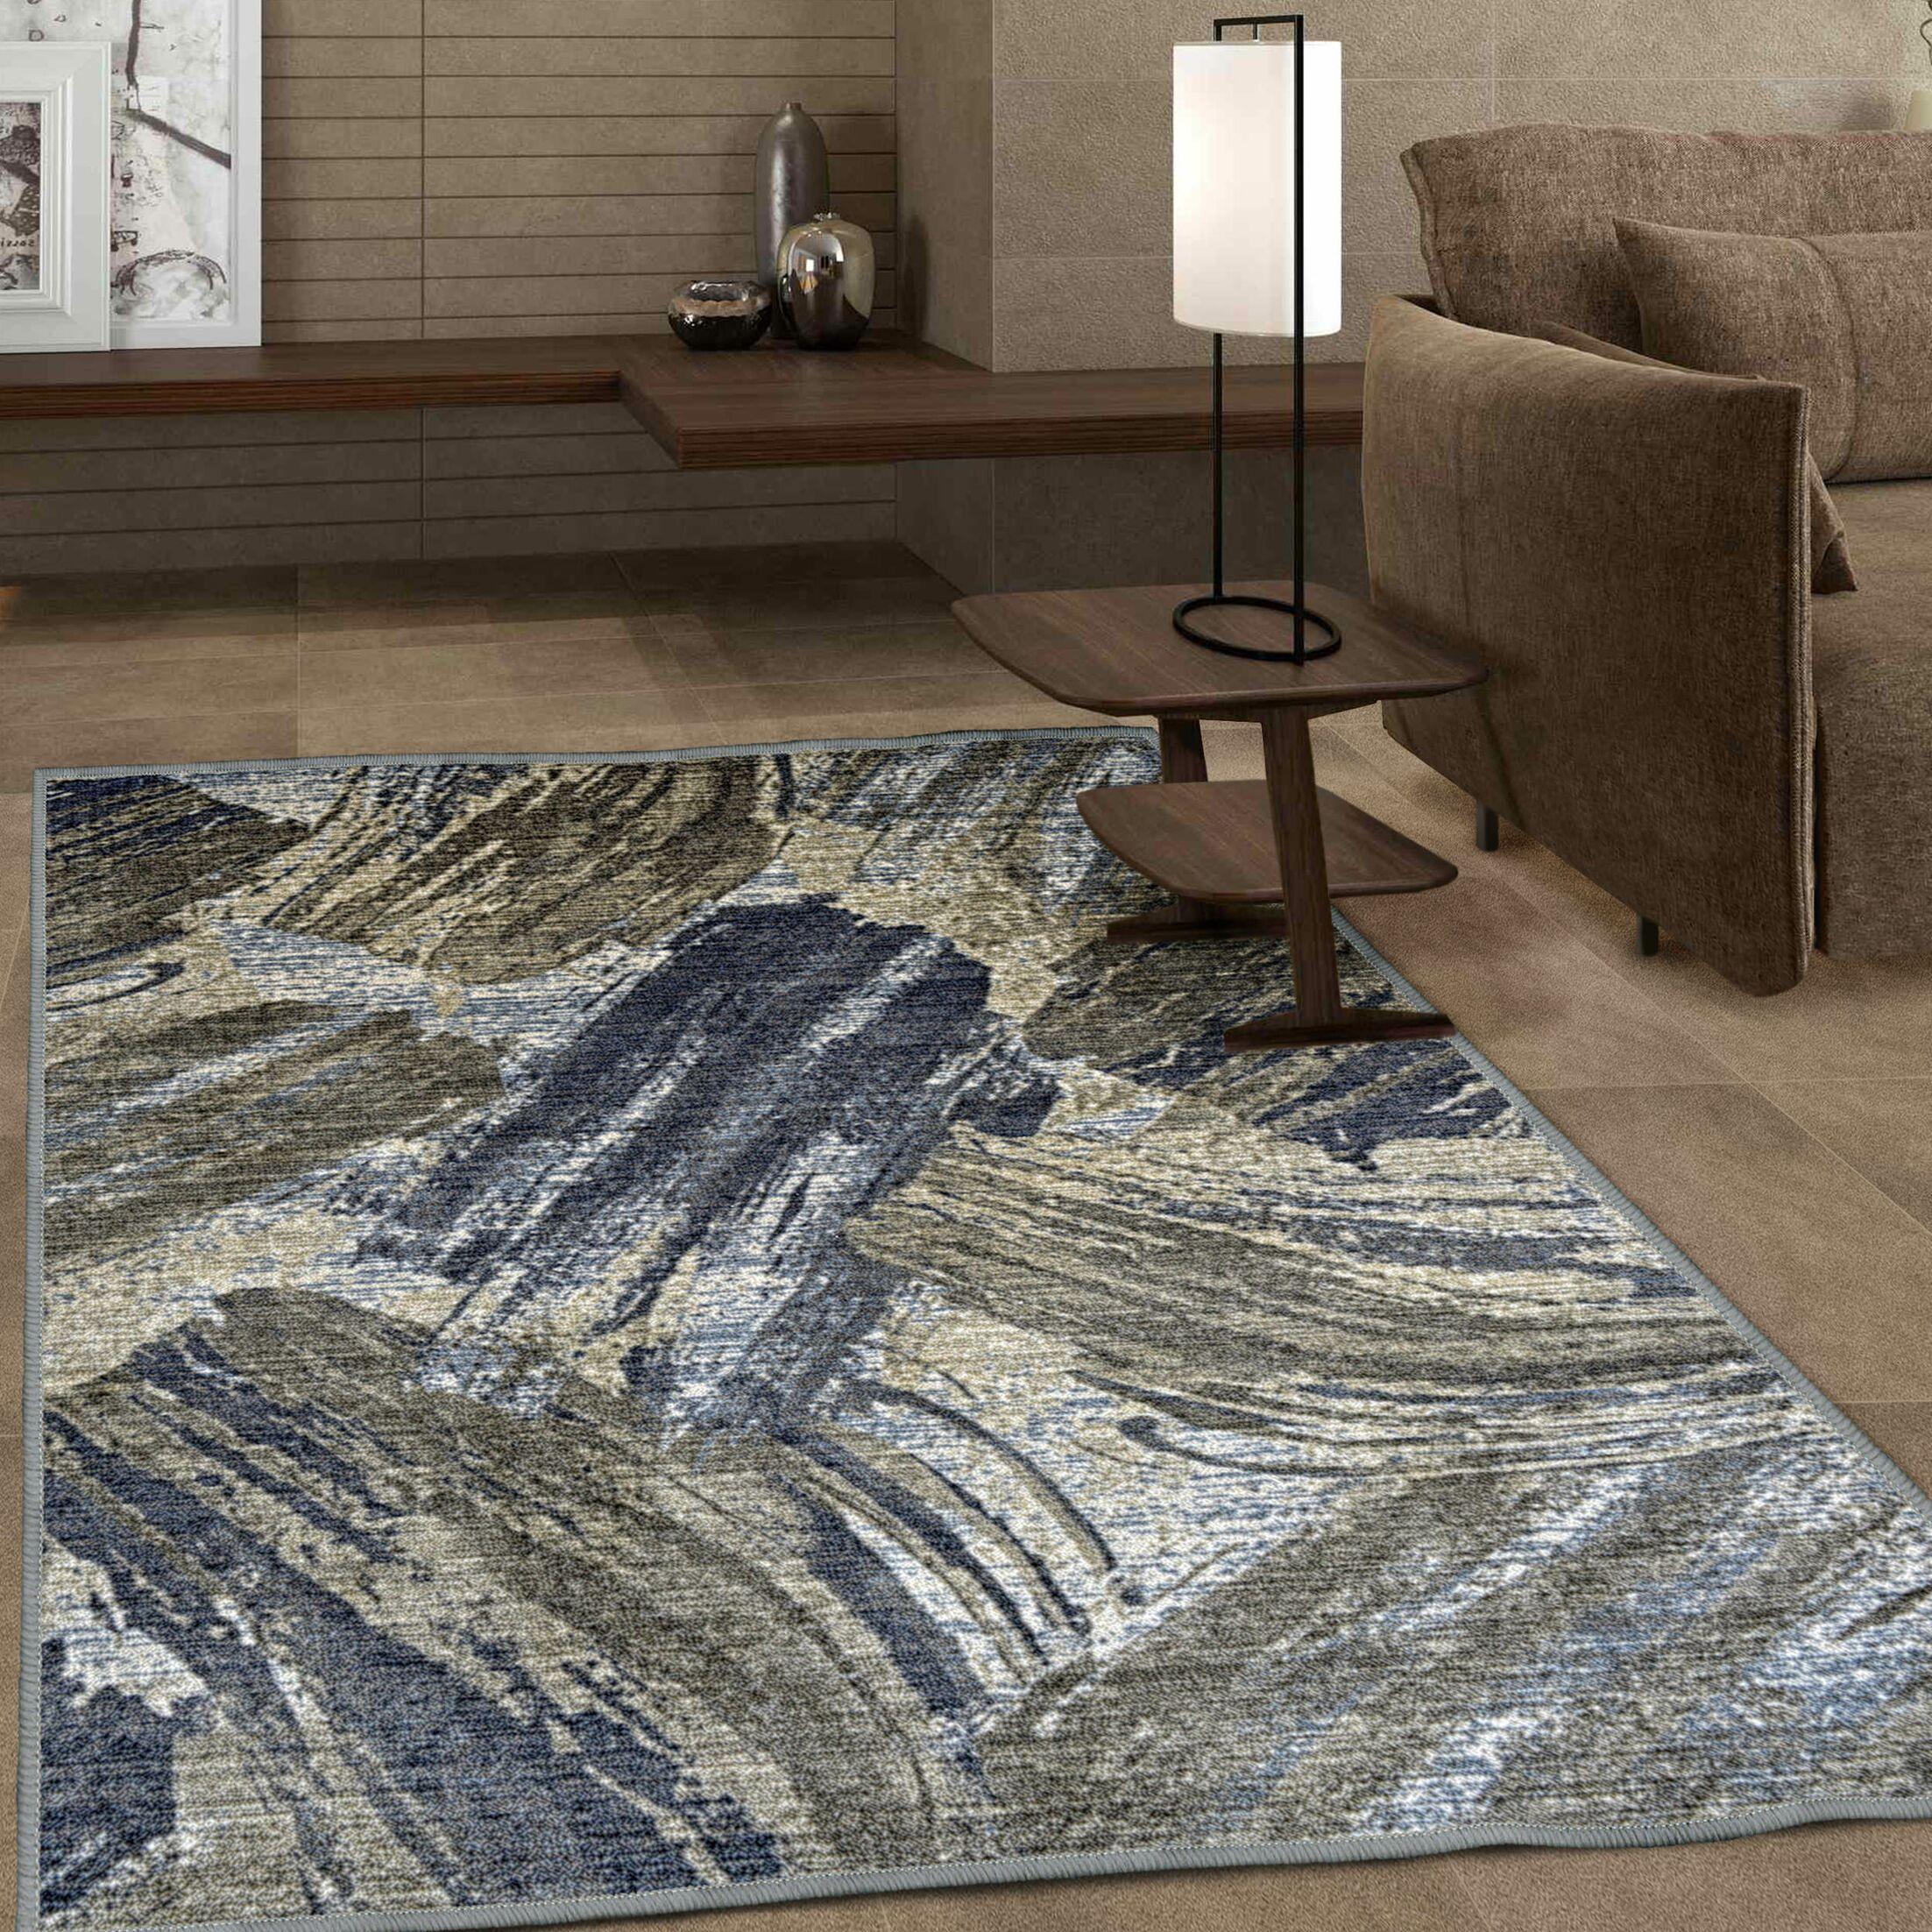 Brannon Printed Non-Slip Gray Area Rug Rug Size: Rectangle 8' x 10'